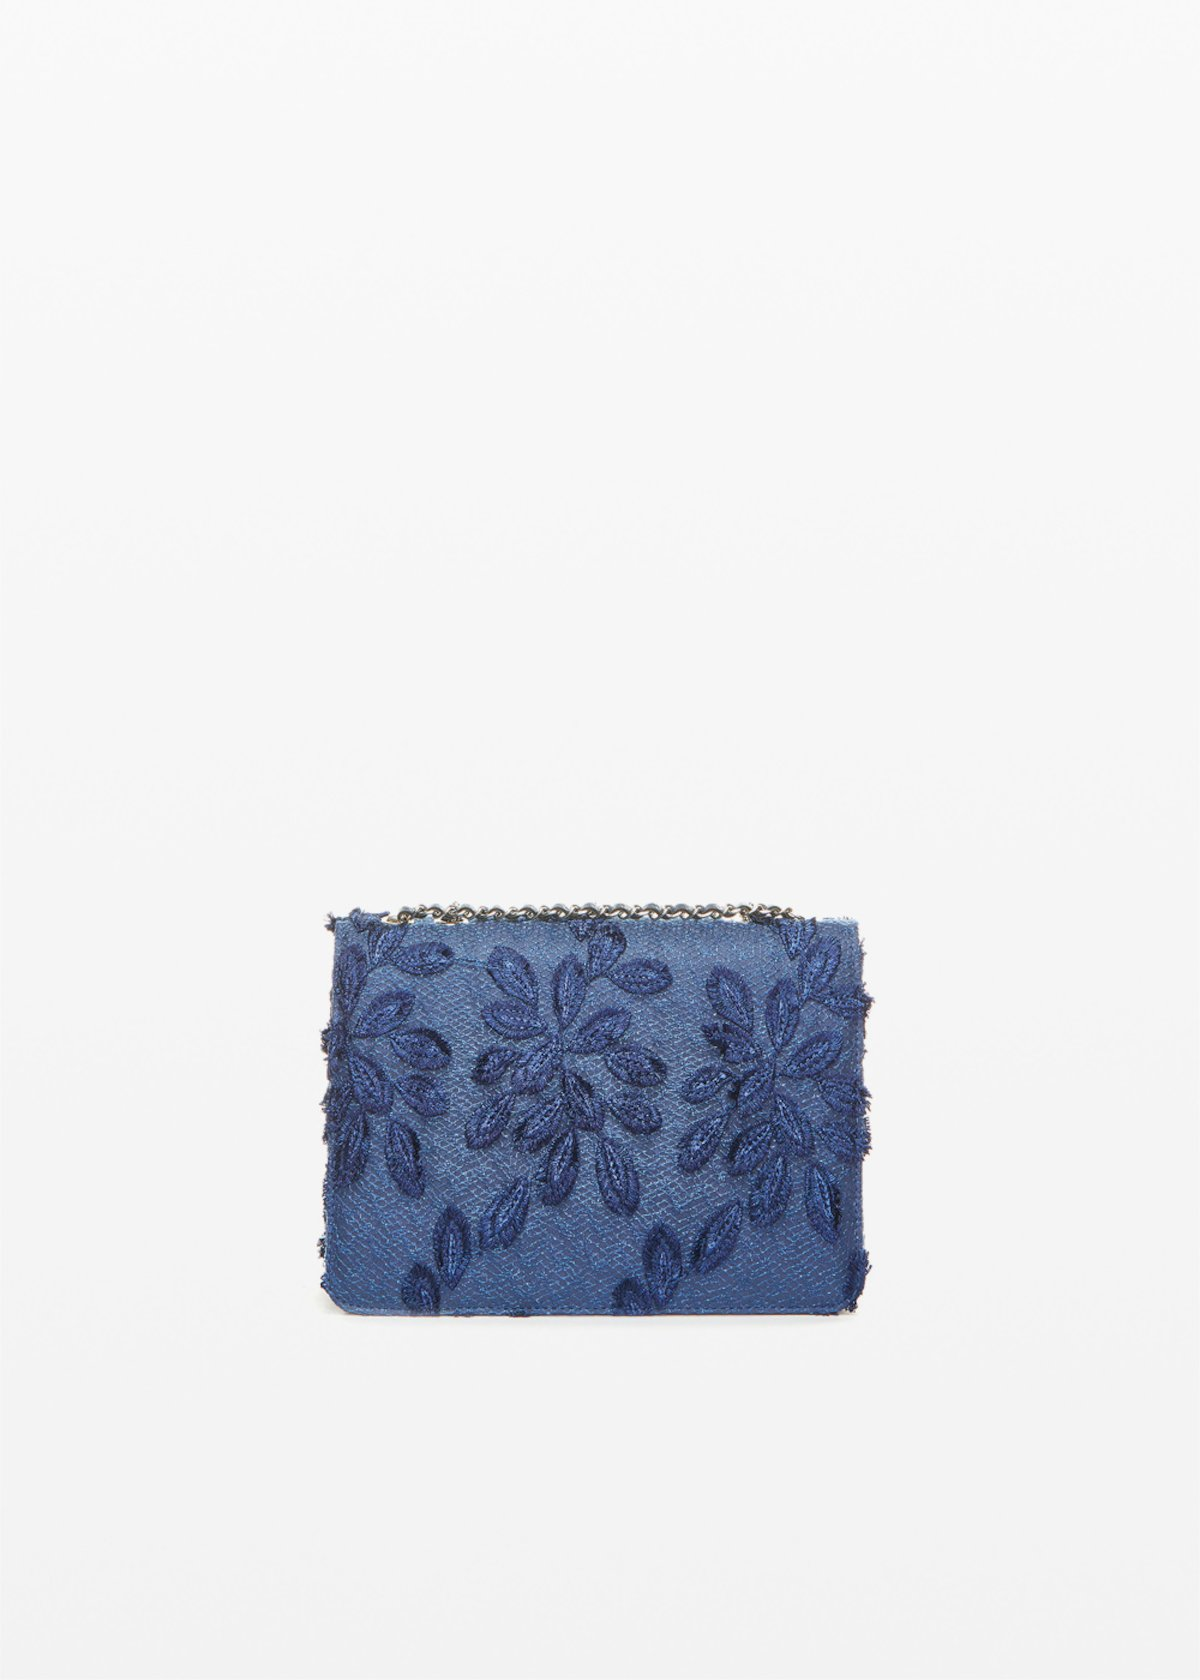 Fede leaf rigid clutch bag with shoulder strap - Dark Blue - Woman - Category image